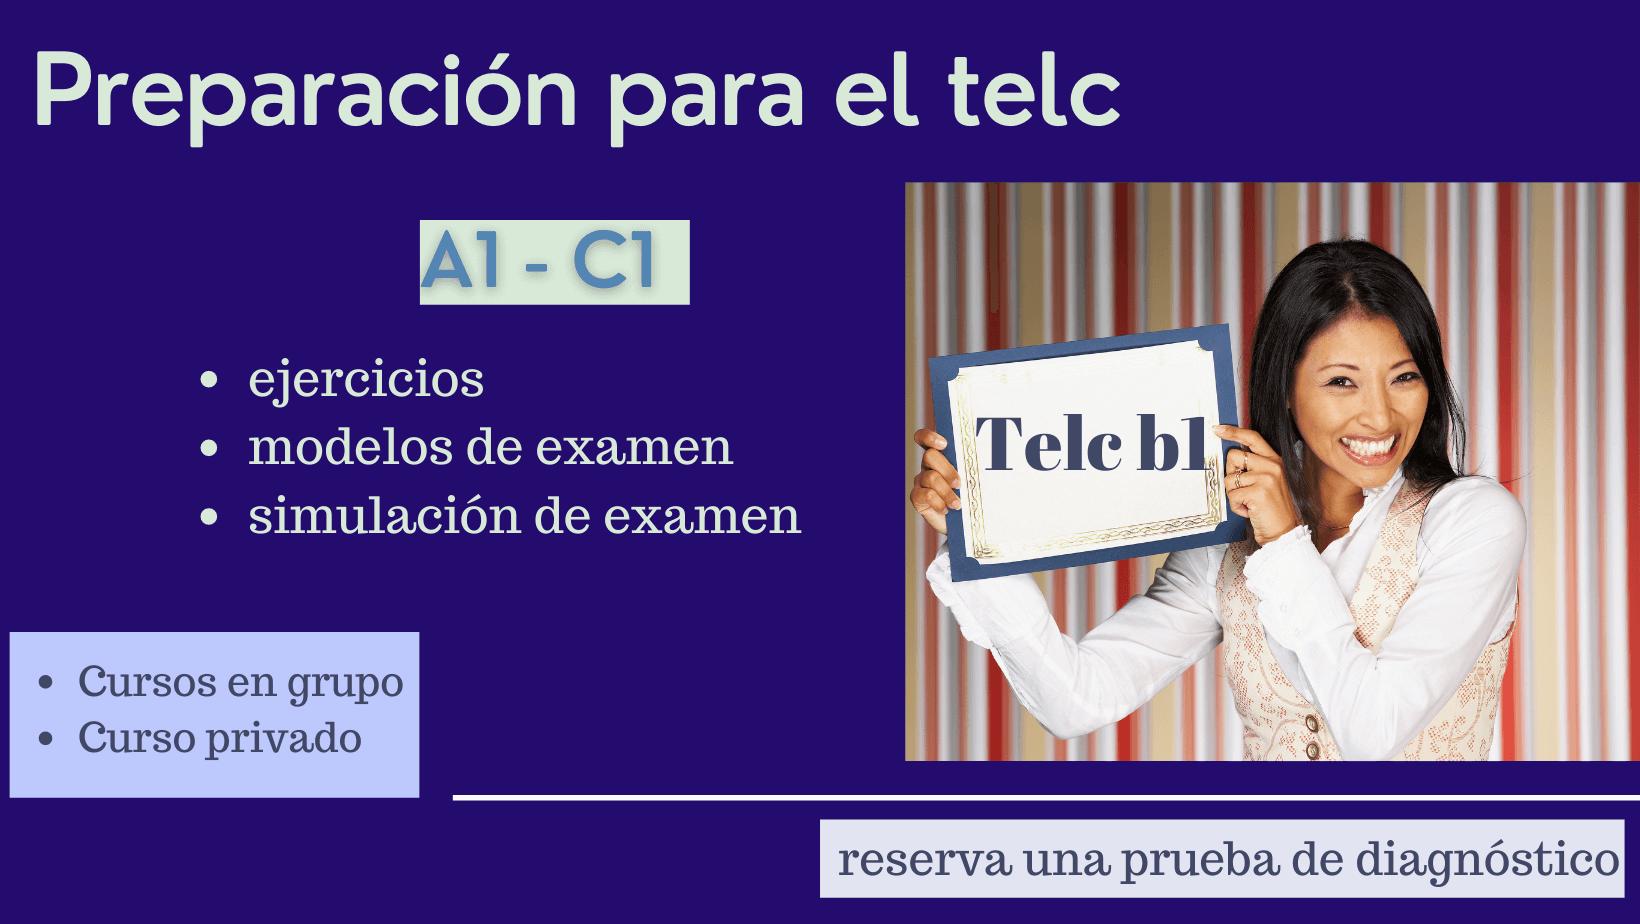 telc_b1 _kurs